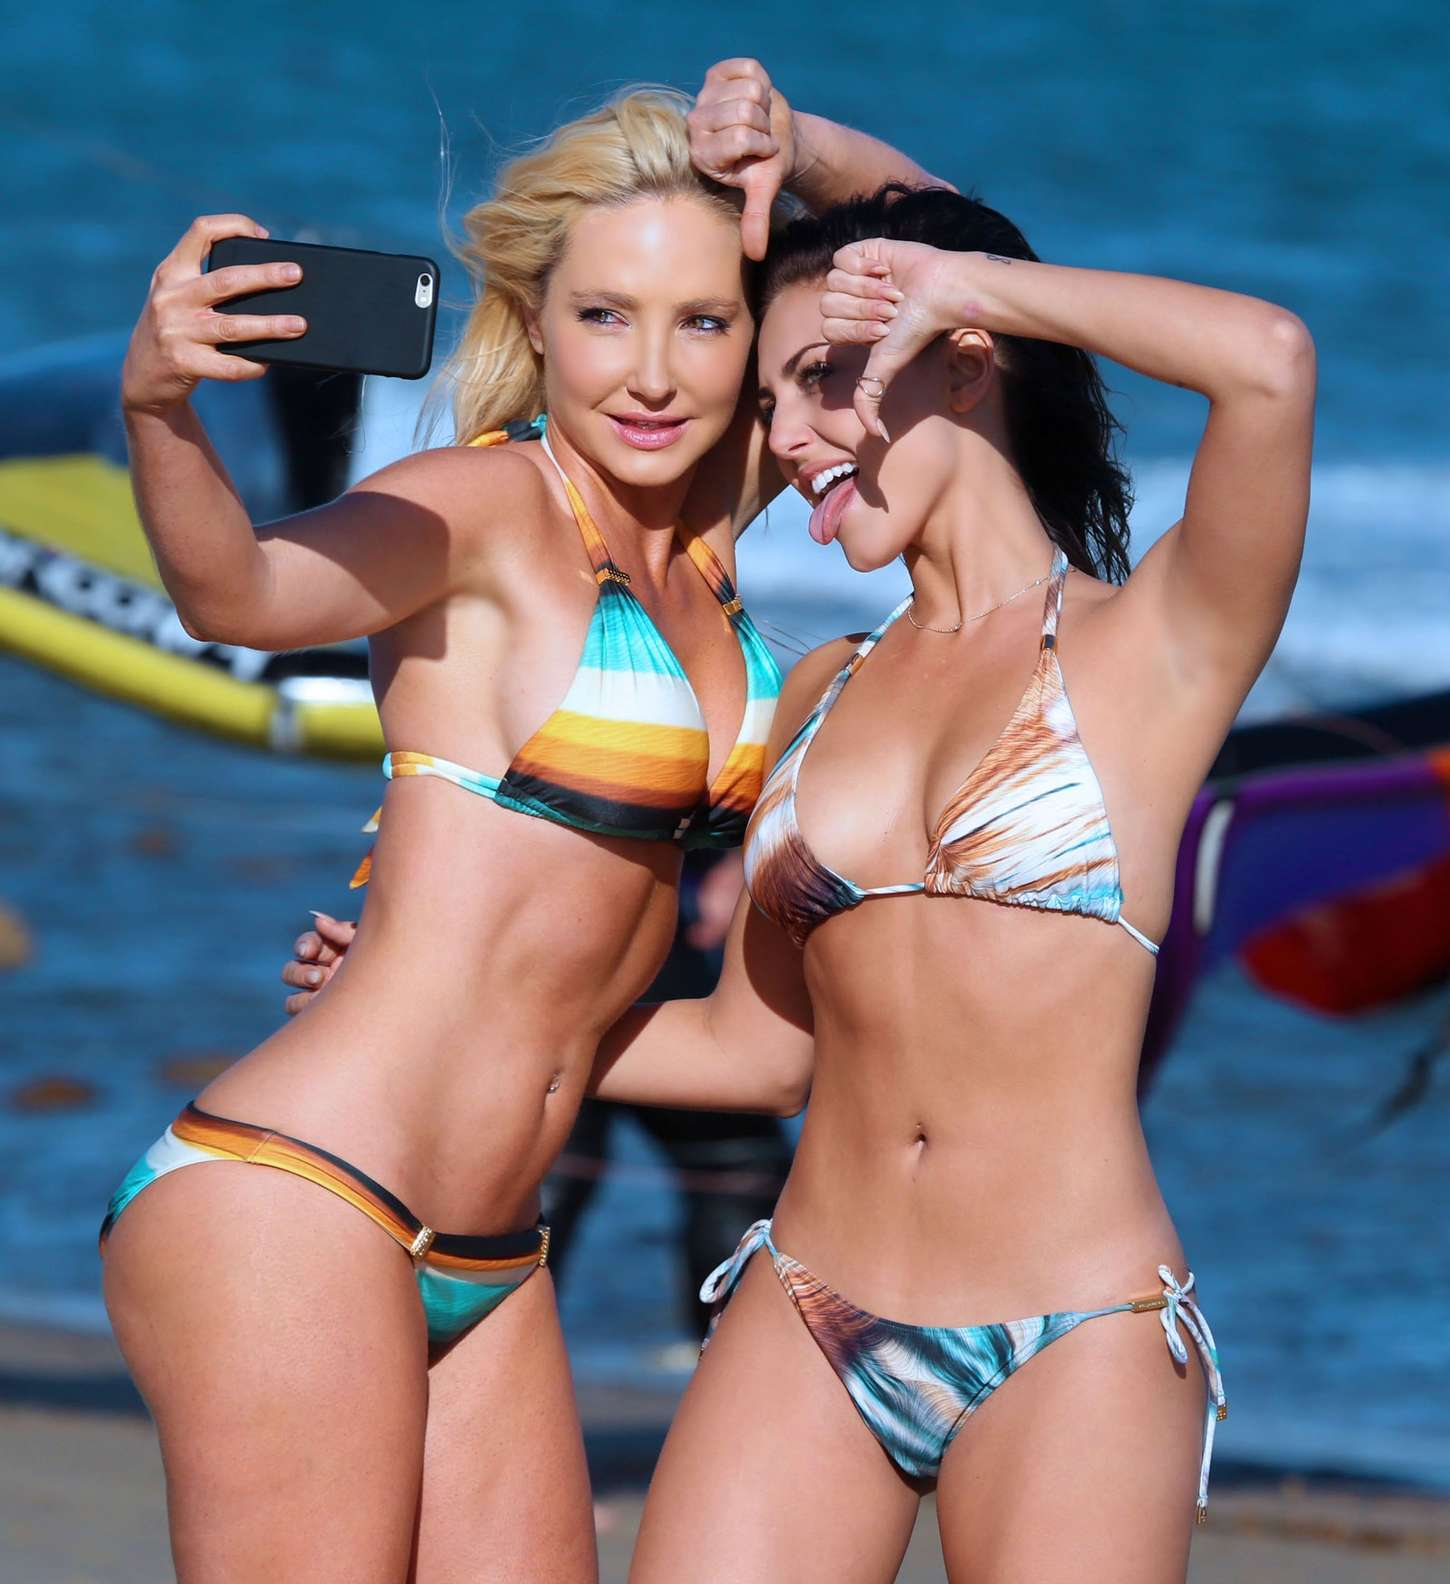 Bikini CBikiniie Scerbo naked (52 photos), Sexy, Bikini, Selfie, in bikini 2017